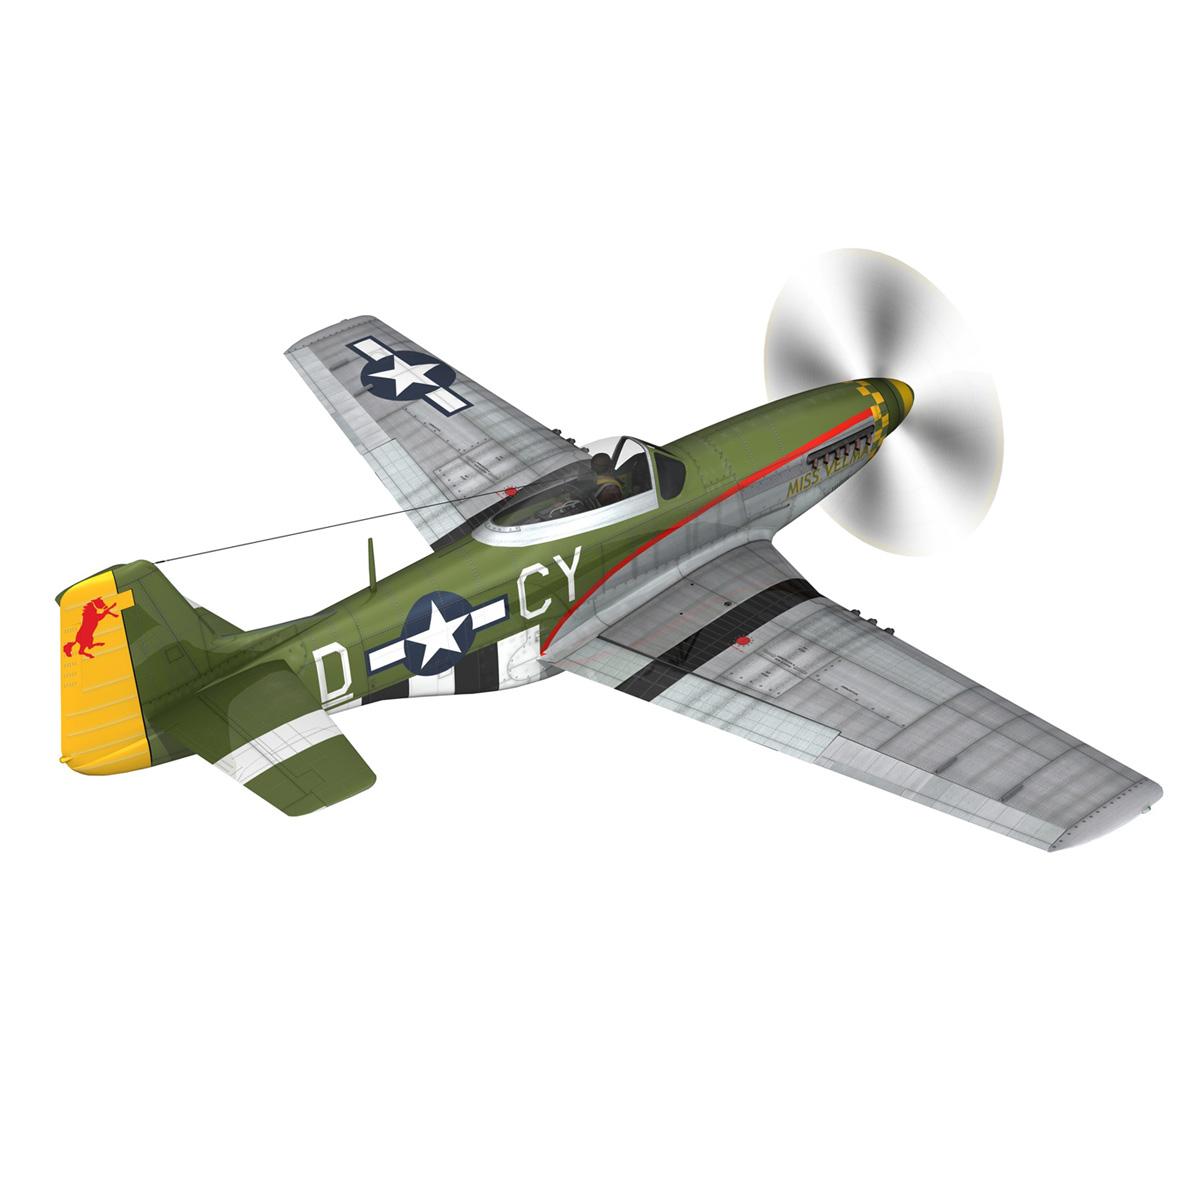 north american p-51d – mustang – miss velma 3d model 3ds fbx c4d lwo obj 267621